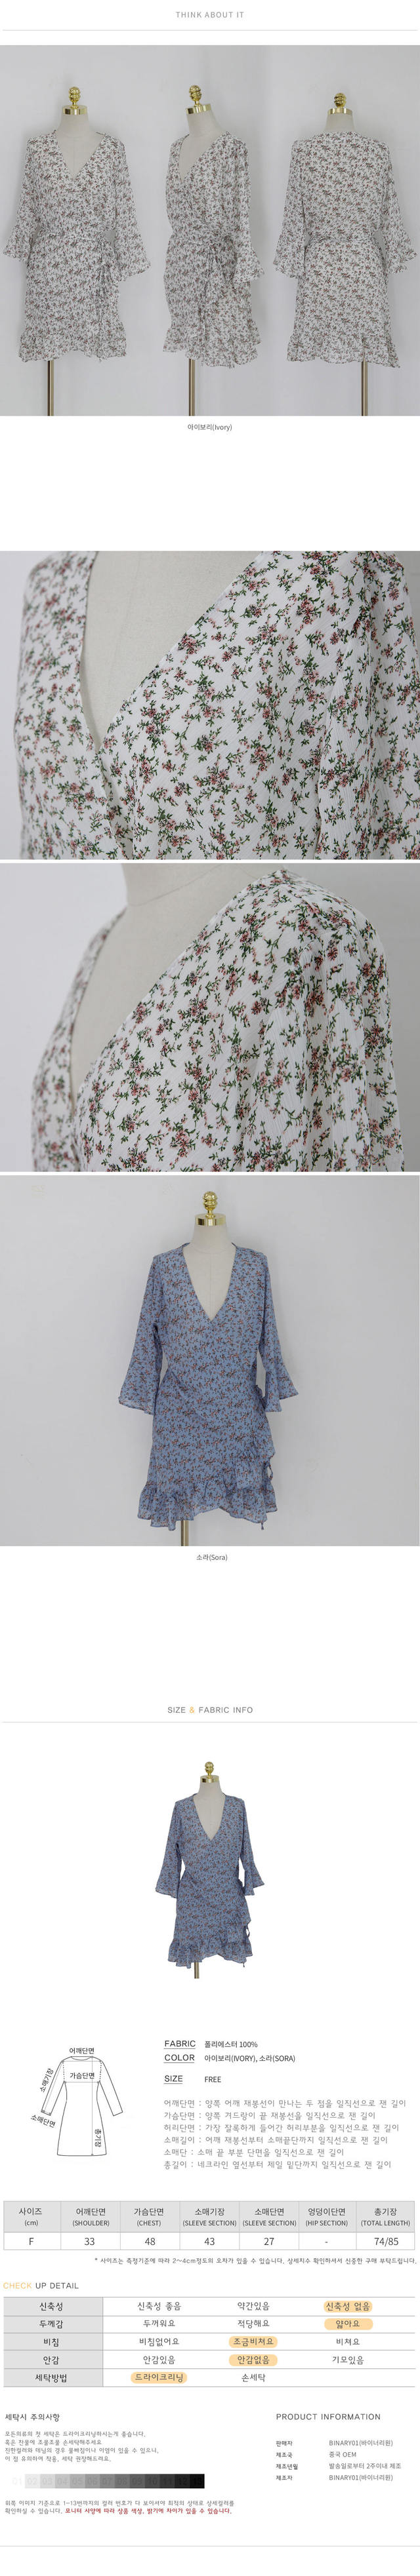 Flower cellaz wrap dress